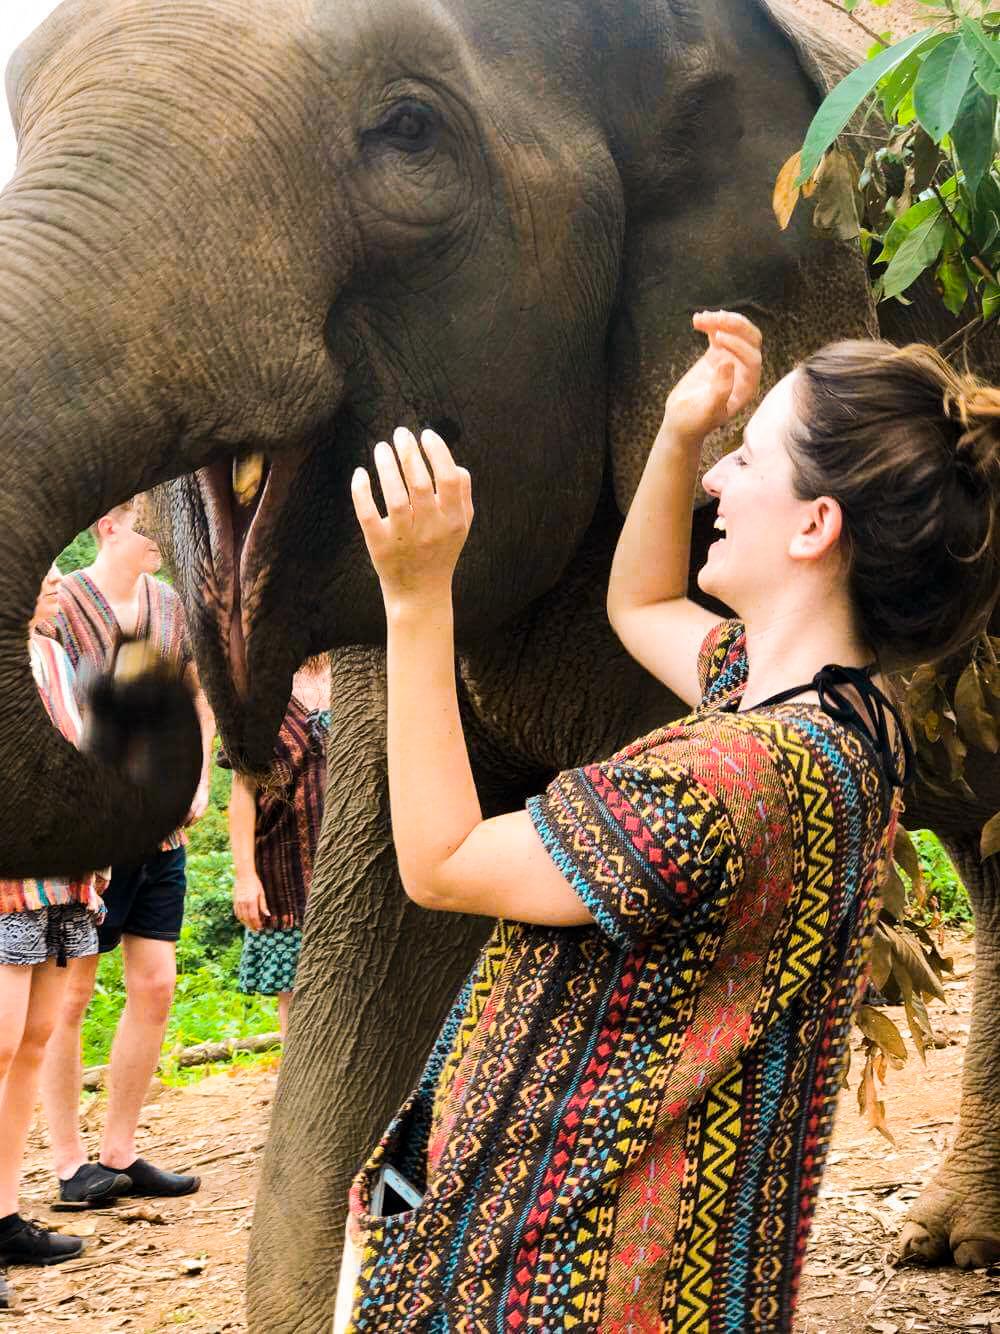 Me hand feeding an elephant at Elephant Jungle Sanctuary